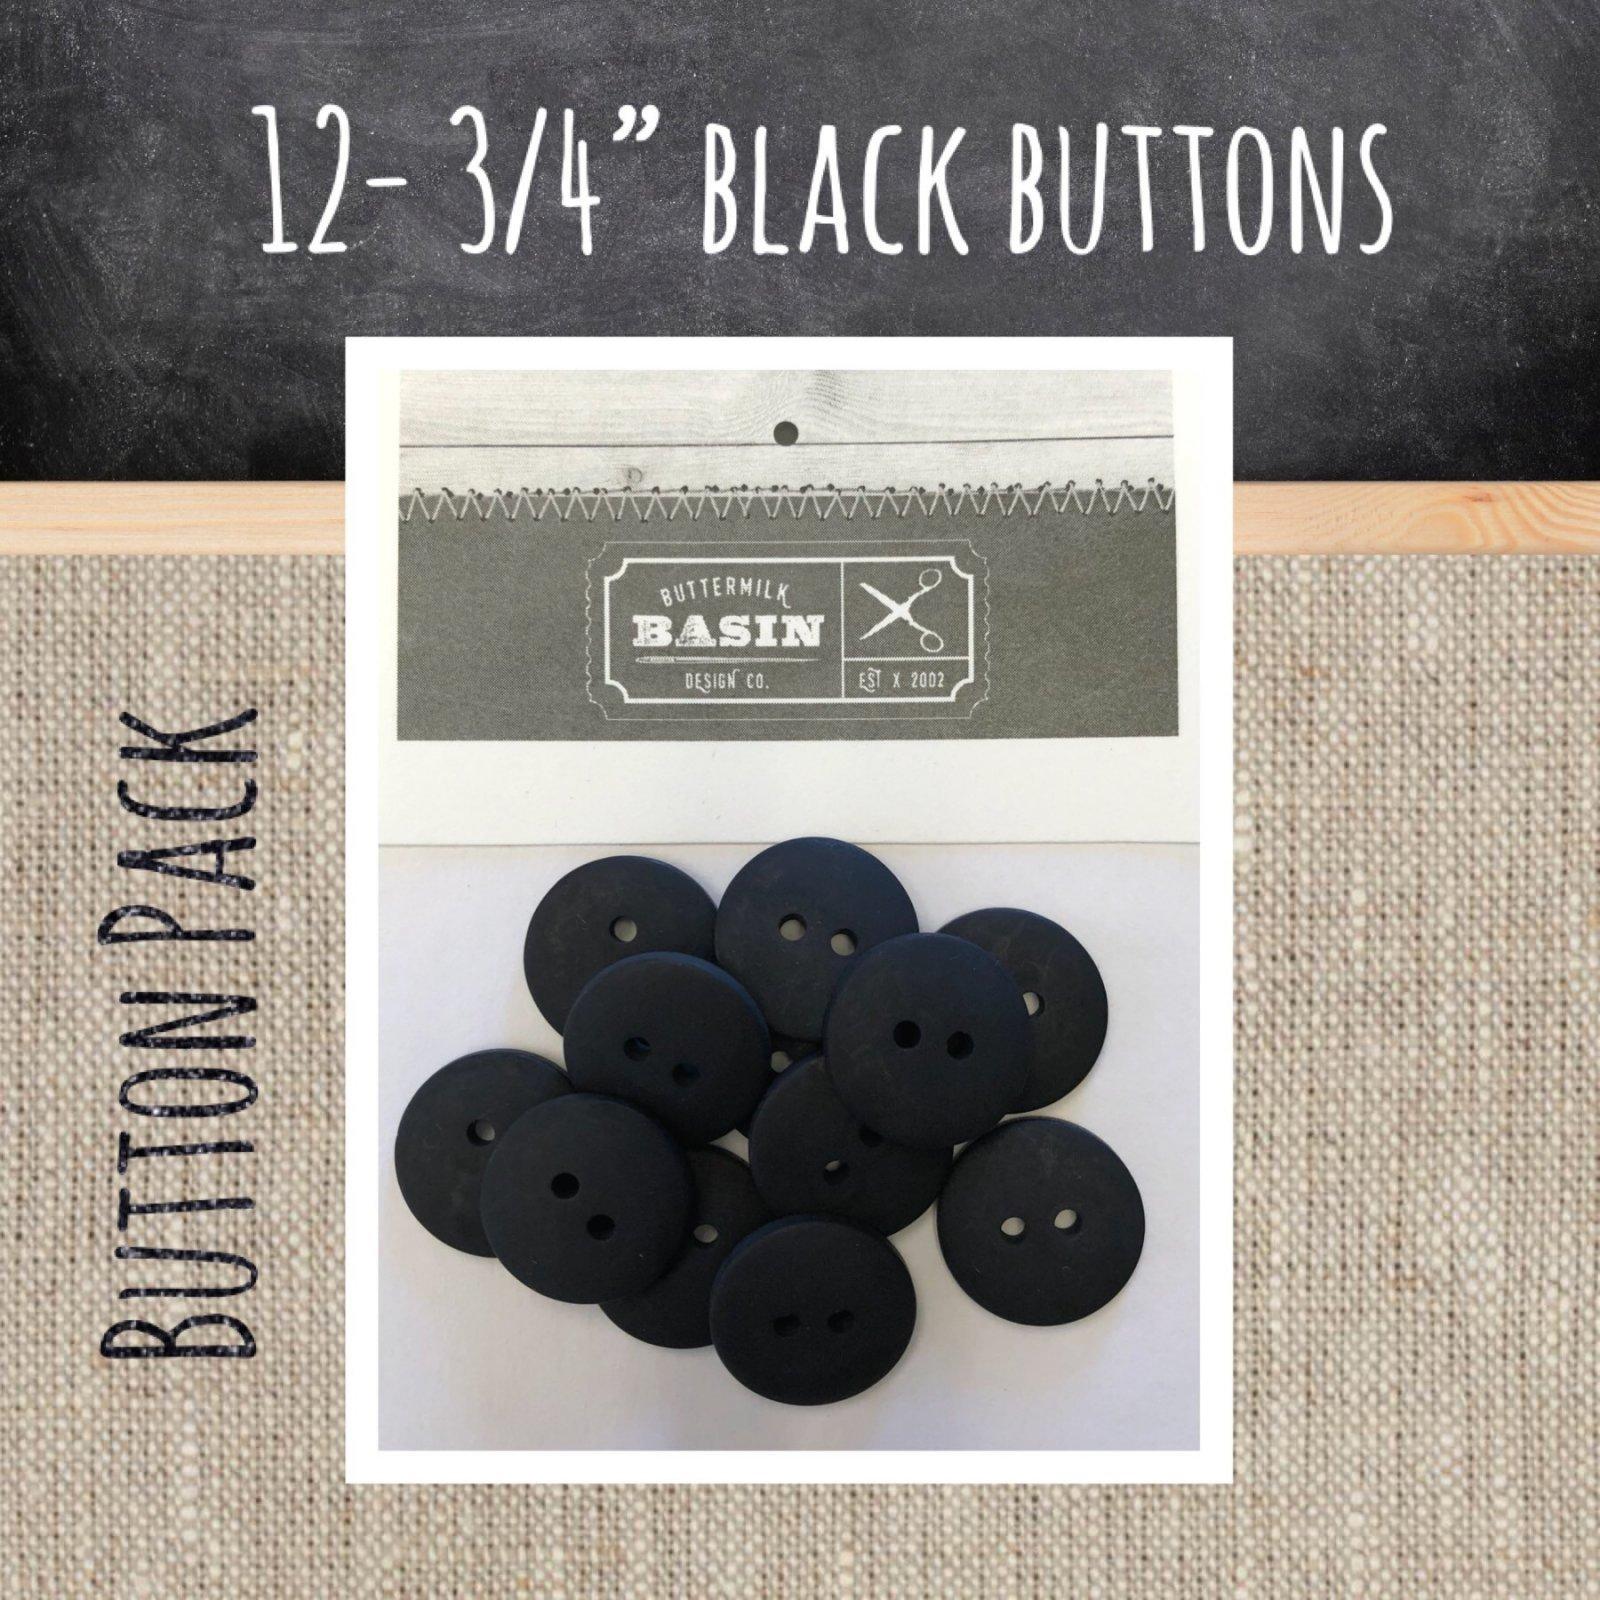 BMB 3/4 Button Pack Black